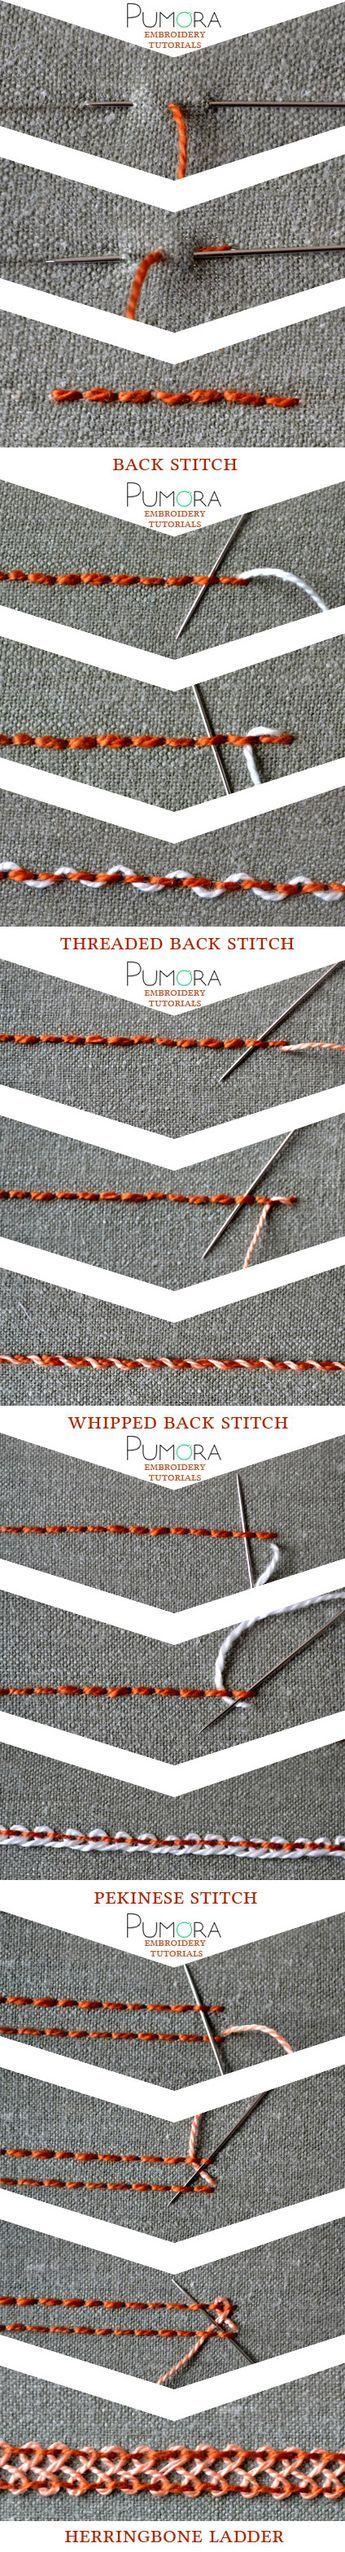 embroidery tutorials: backstitch with variations bordado, ricamo, broderie…